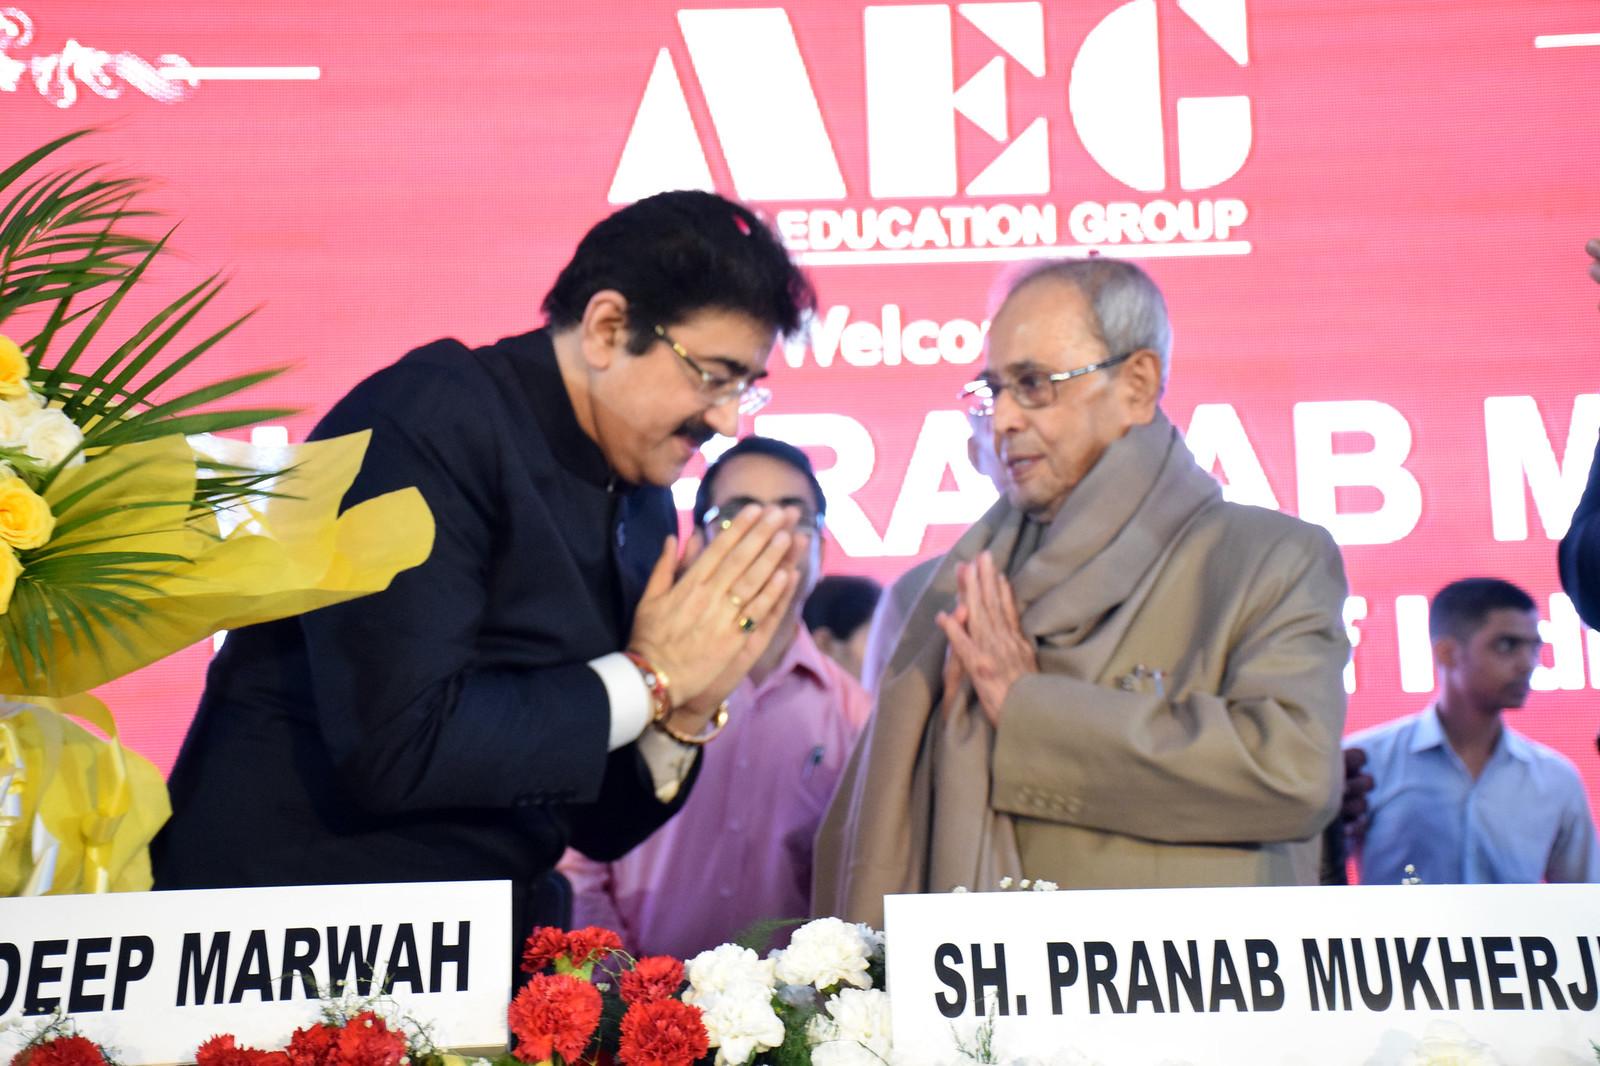 Shri. Pranab Mukherjee at Asian Education Group